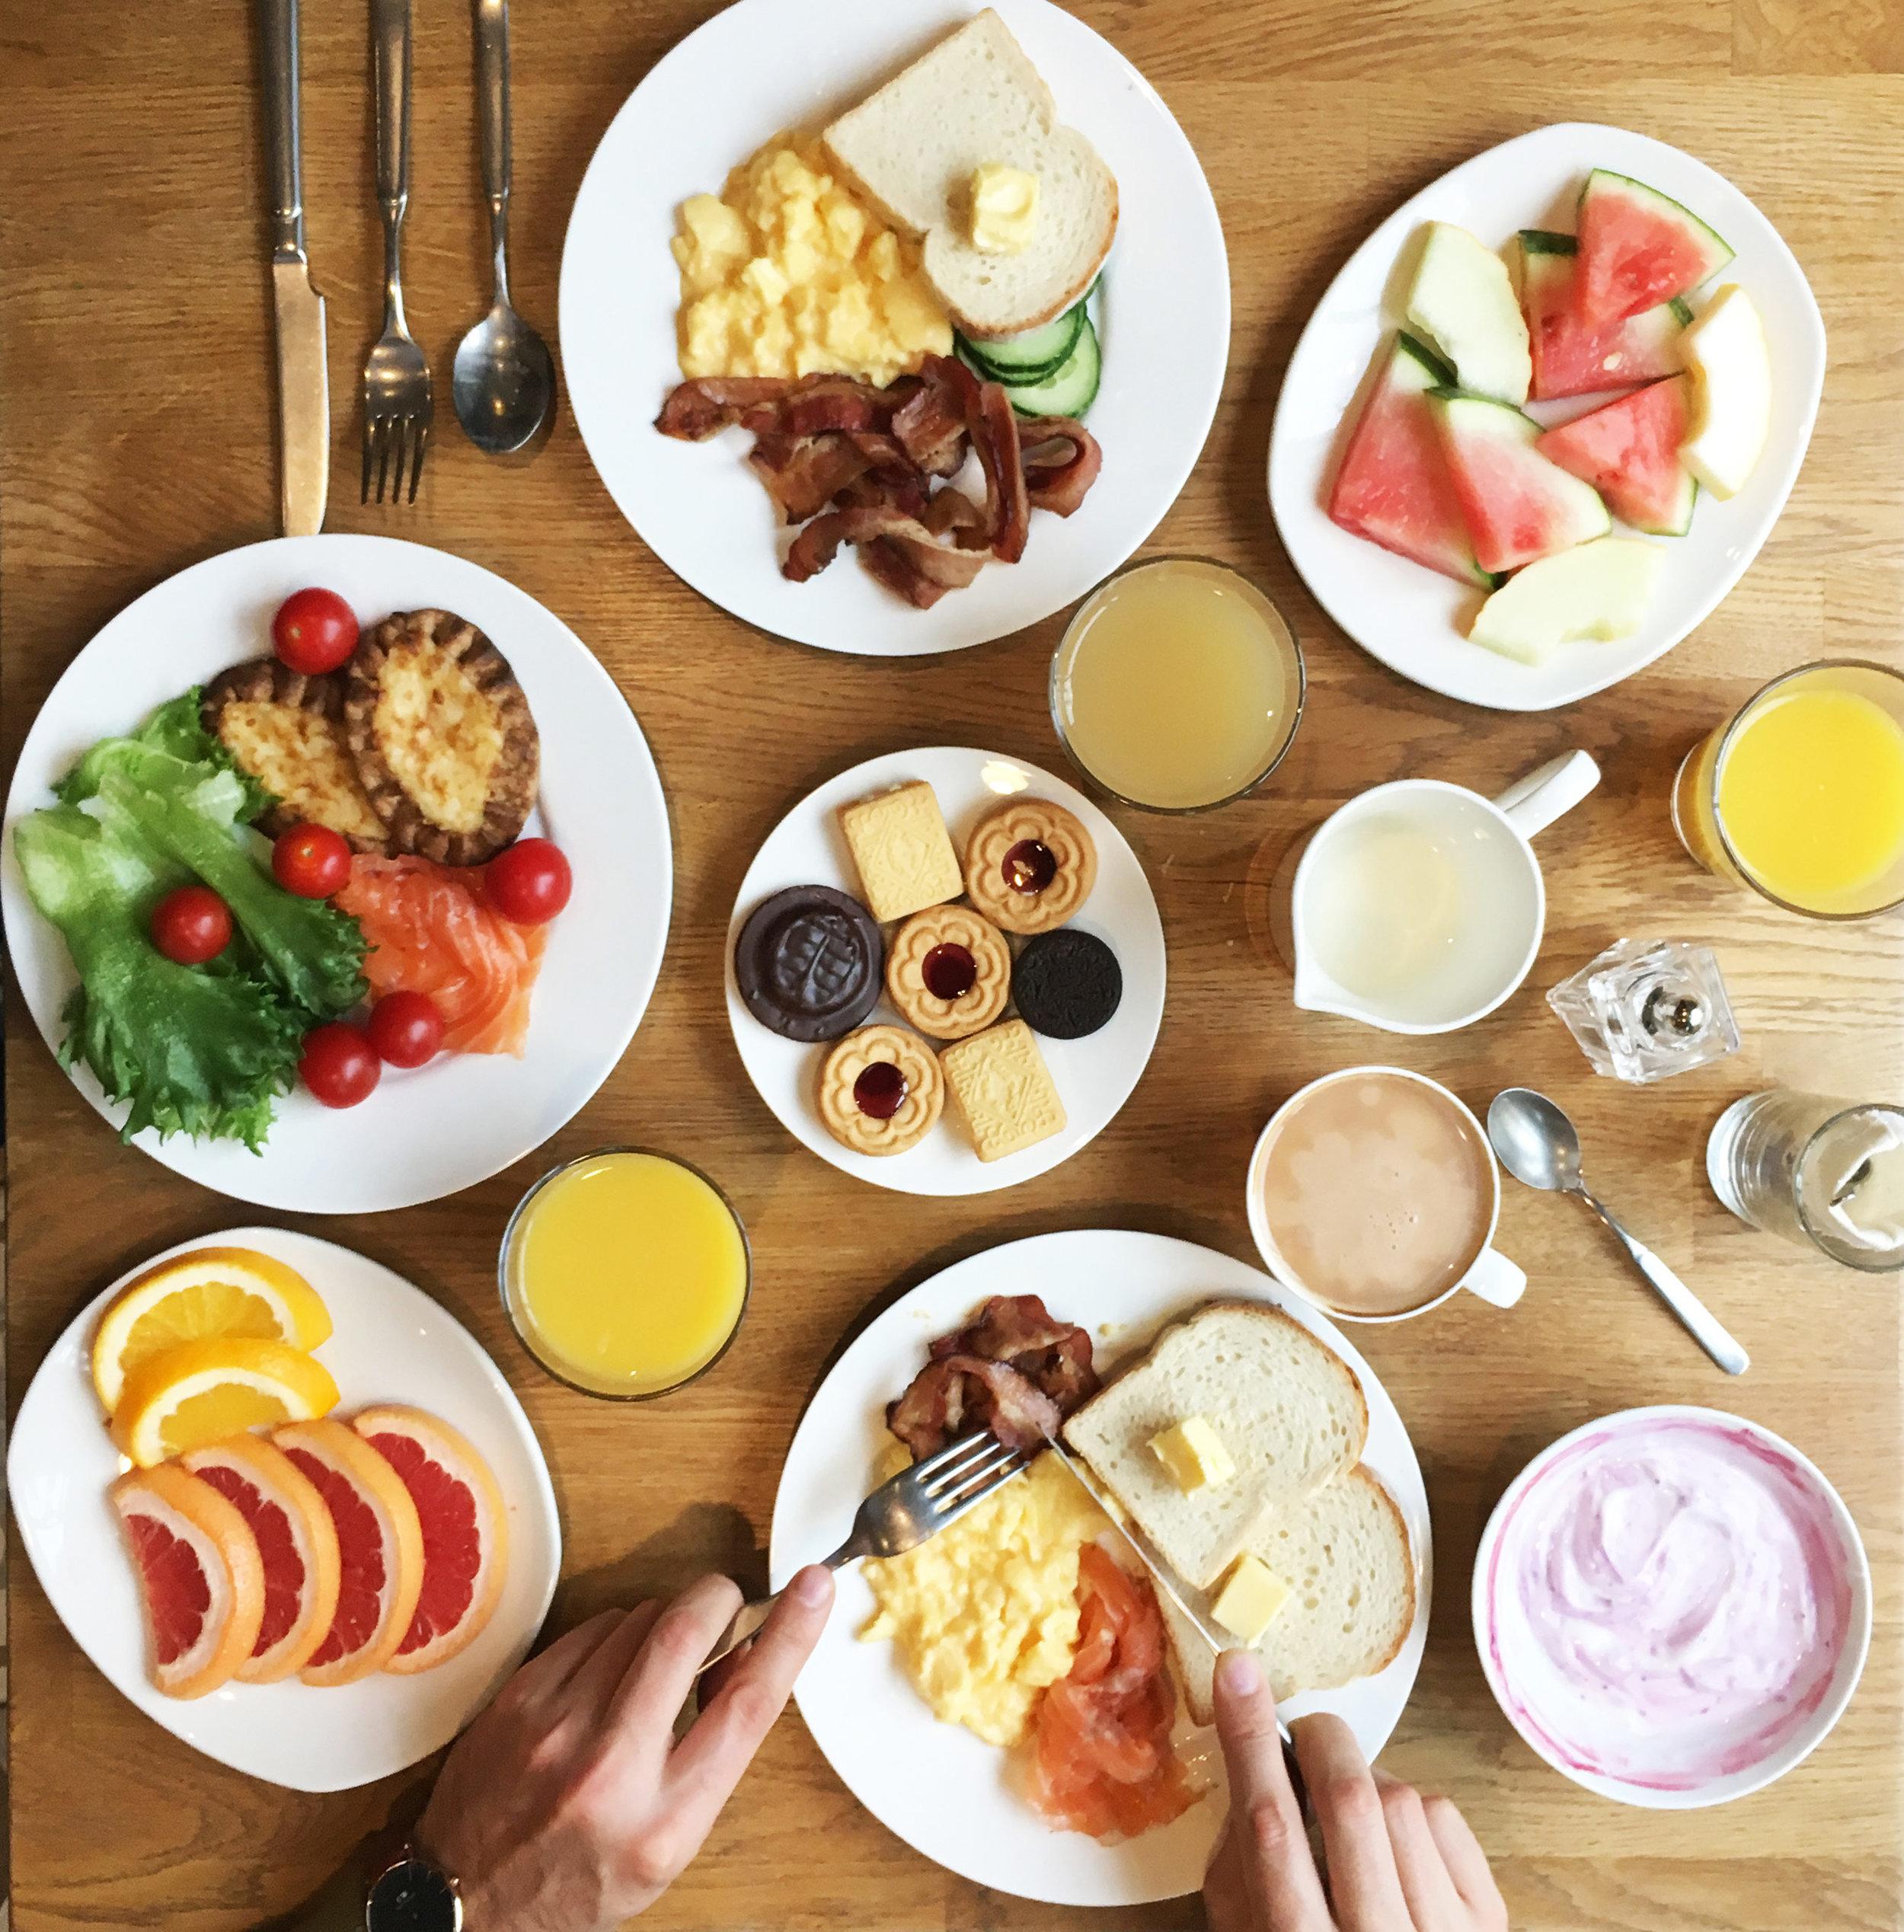 Lilla-Roberts-Breakfast-Flatlay-Hotel_Visit-Finland_Breakfast-Goals-at-Lilla-Roberts_Hello-Miss-May.jpg